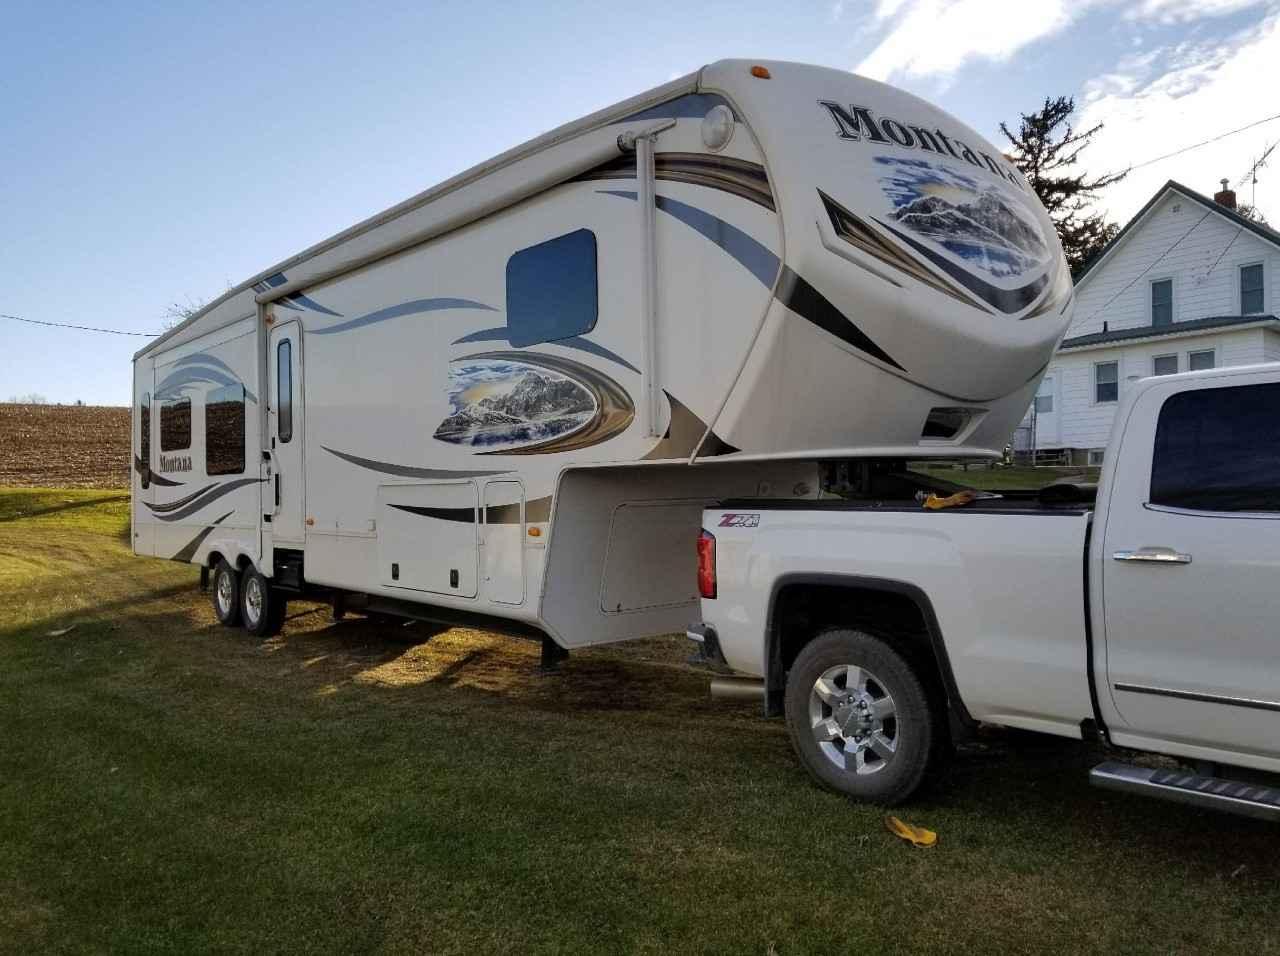 Camper Dealers In Iowa >> 2013 Used Keystone MONTANA 3402RL Fifth Wheel in Iowa IA